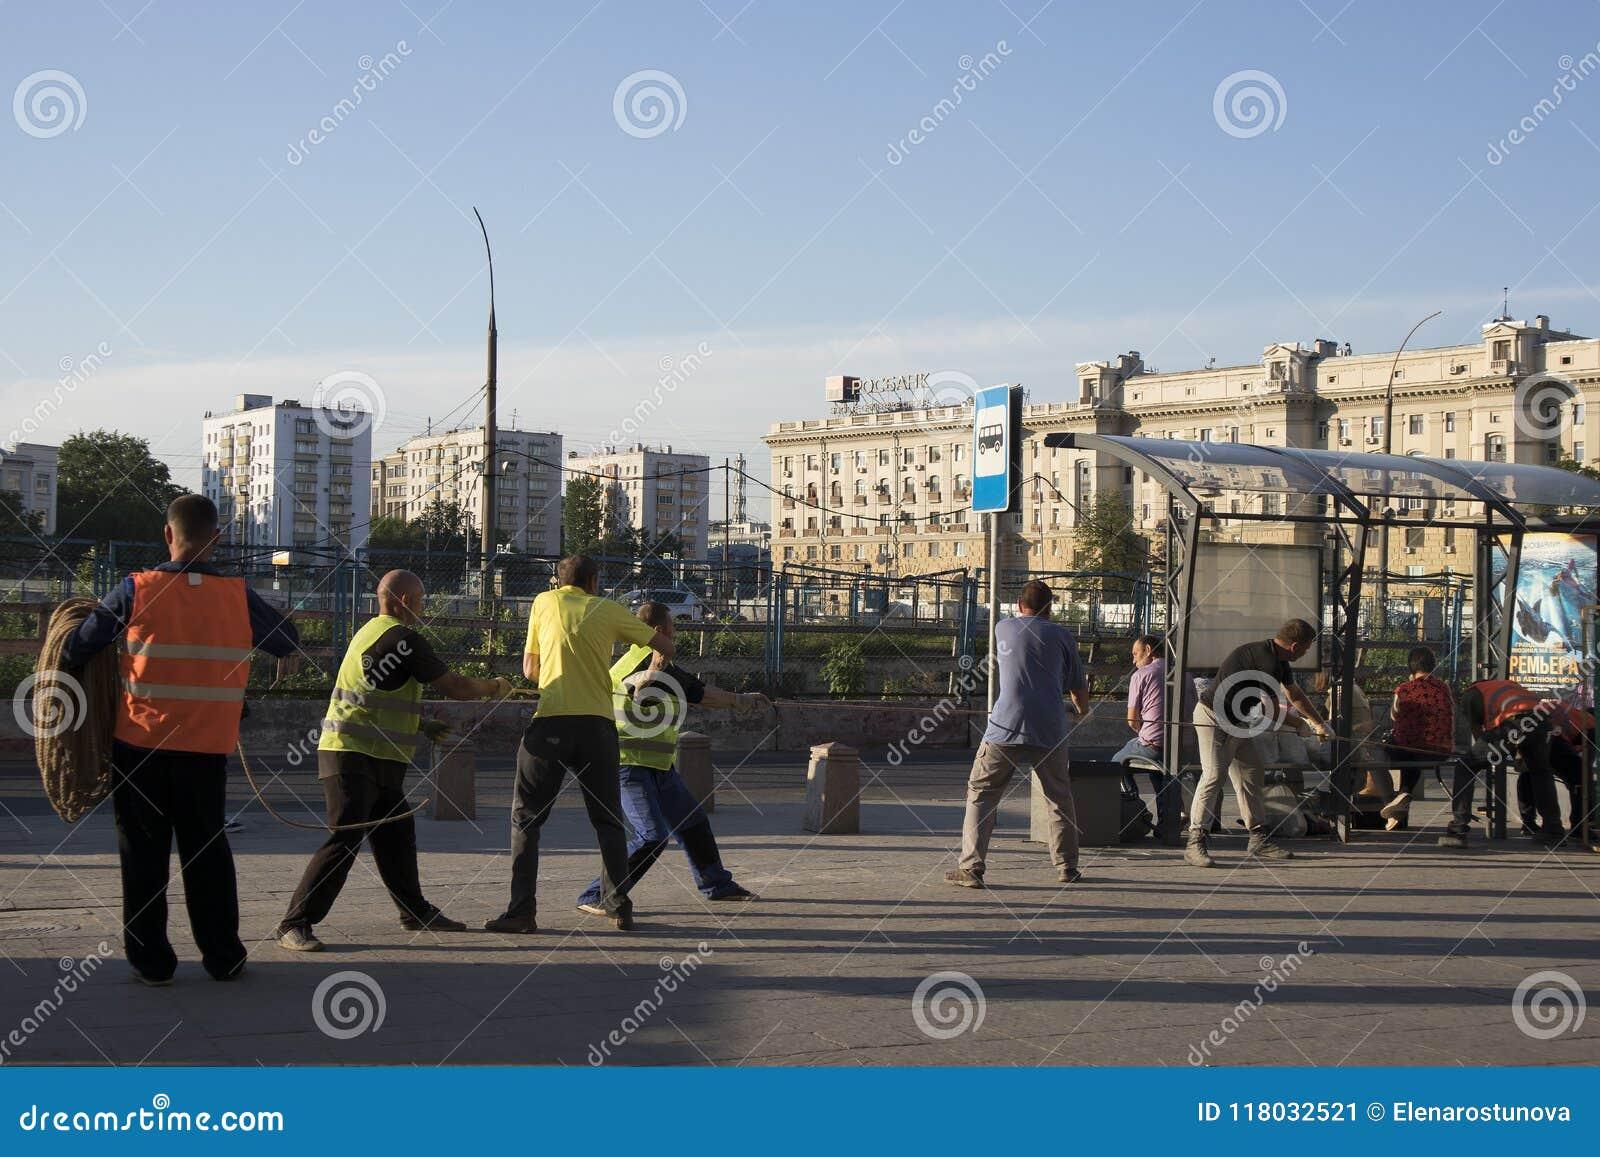 Walking around Moscow 5